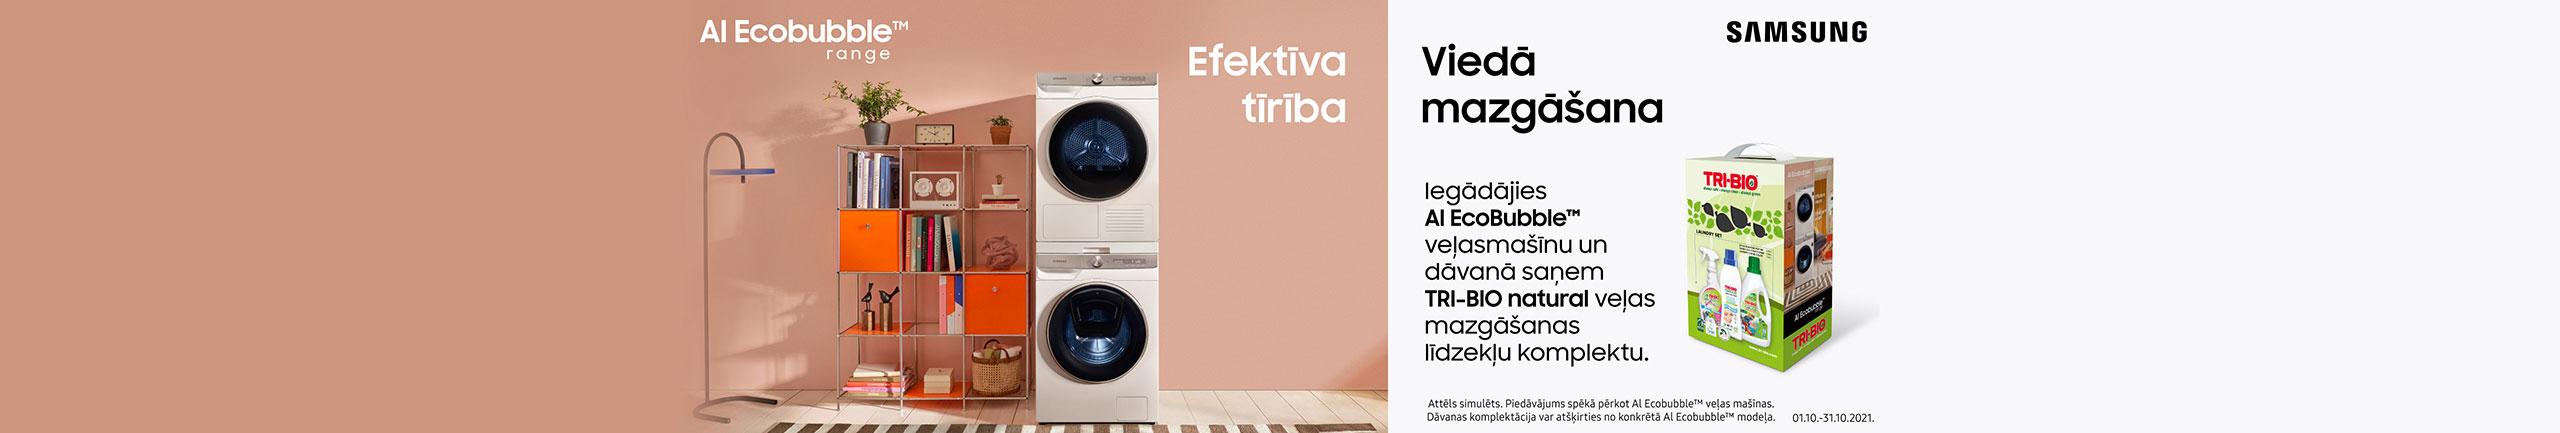 FPS Ecobub